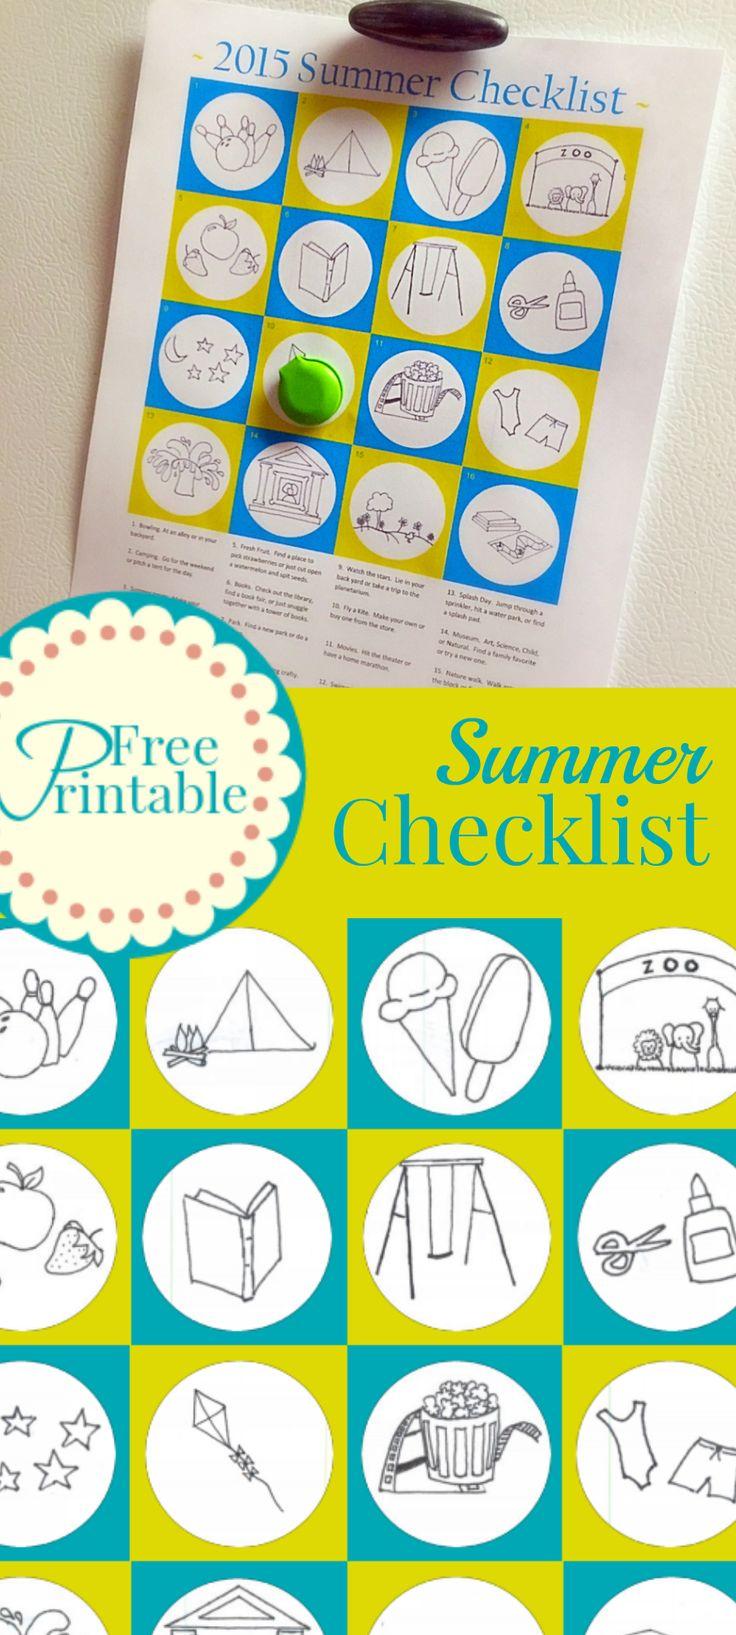 2015 Summer Checklist Free Printable ideas for a summer bucket list.